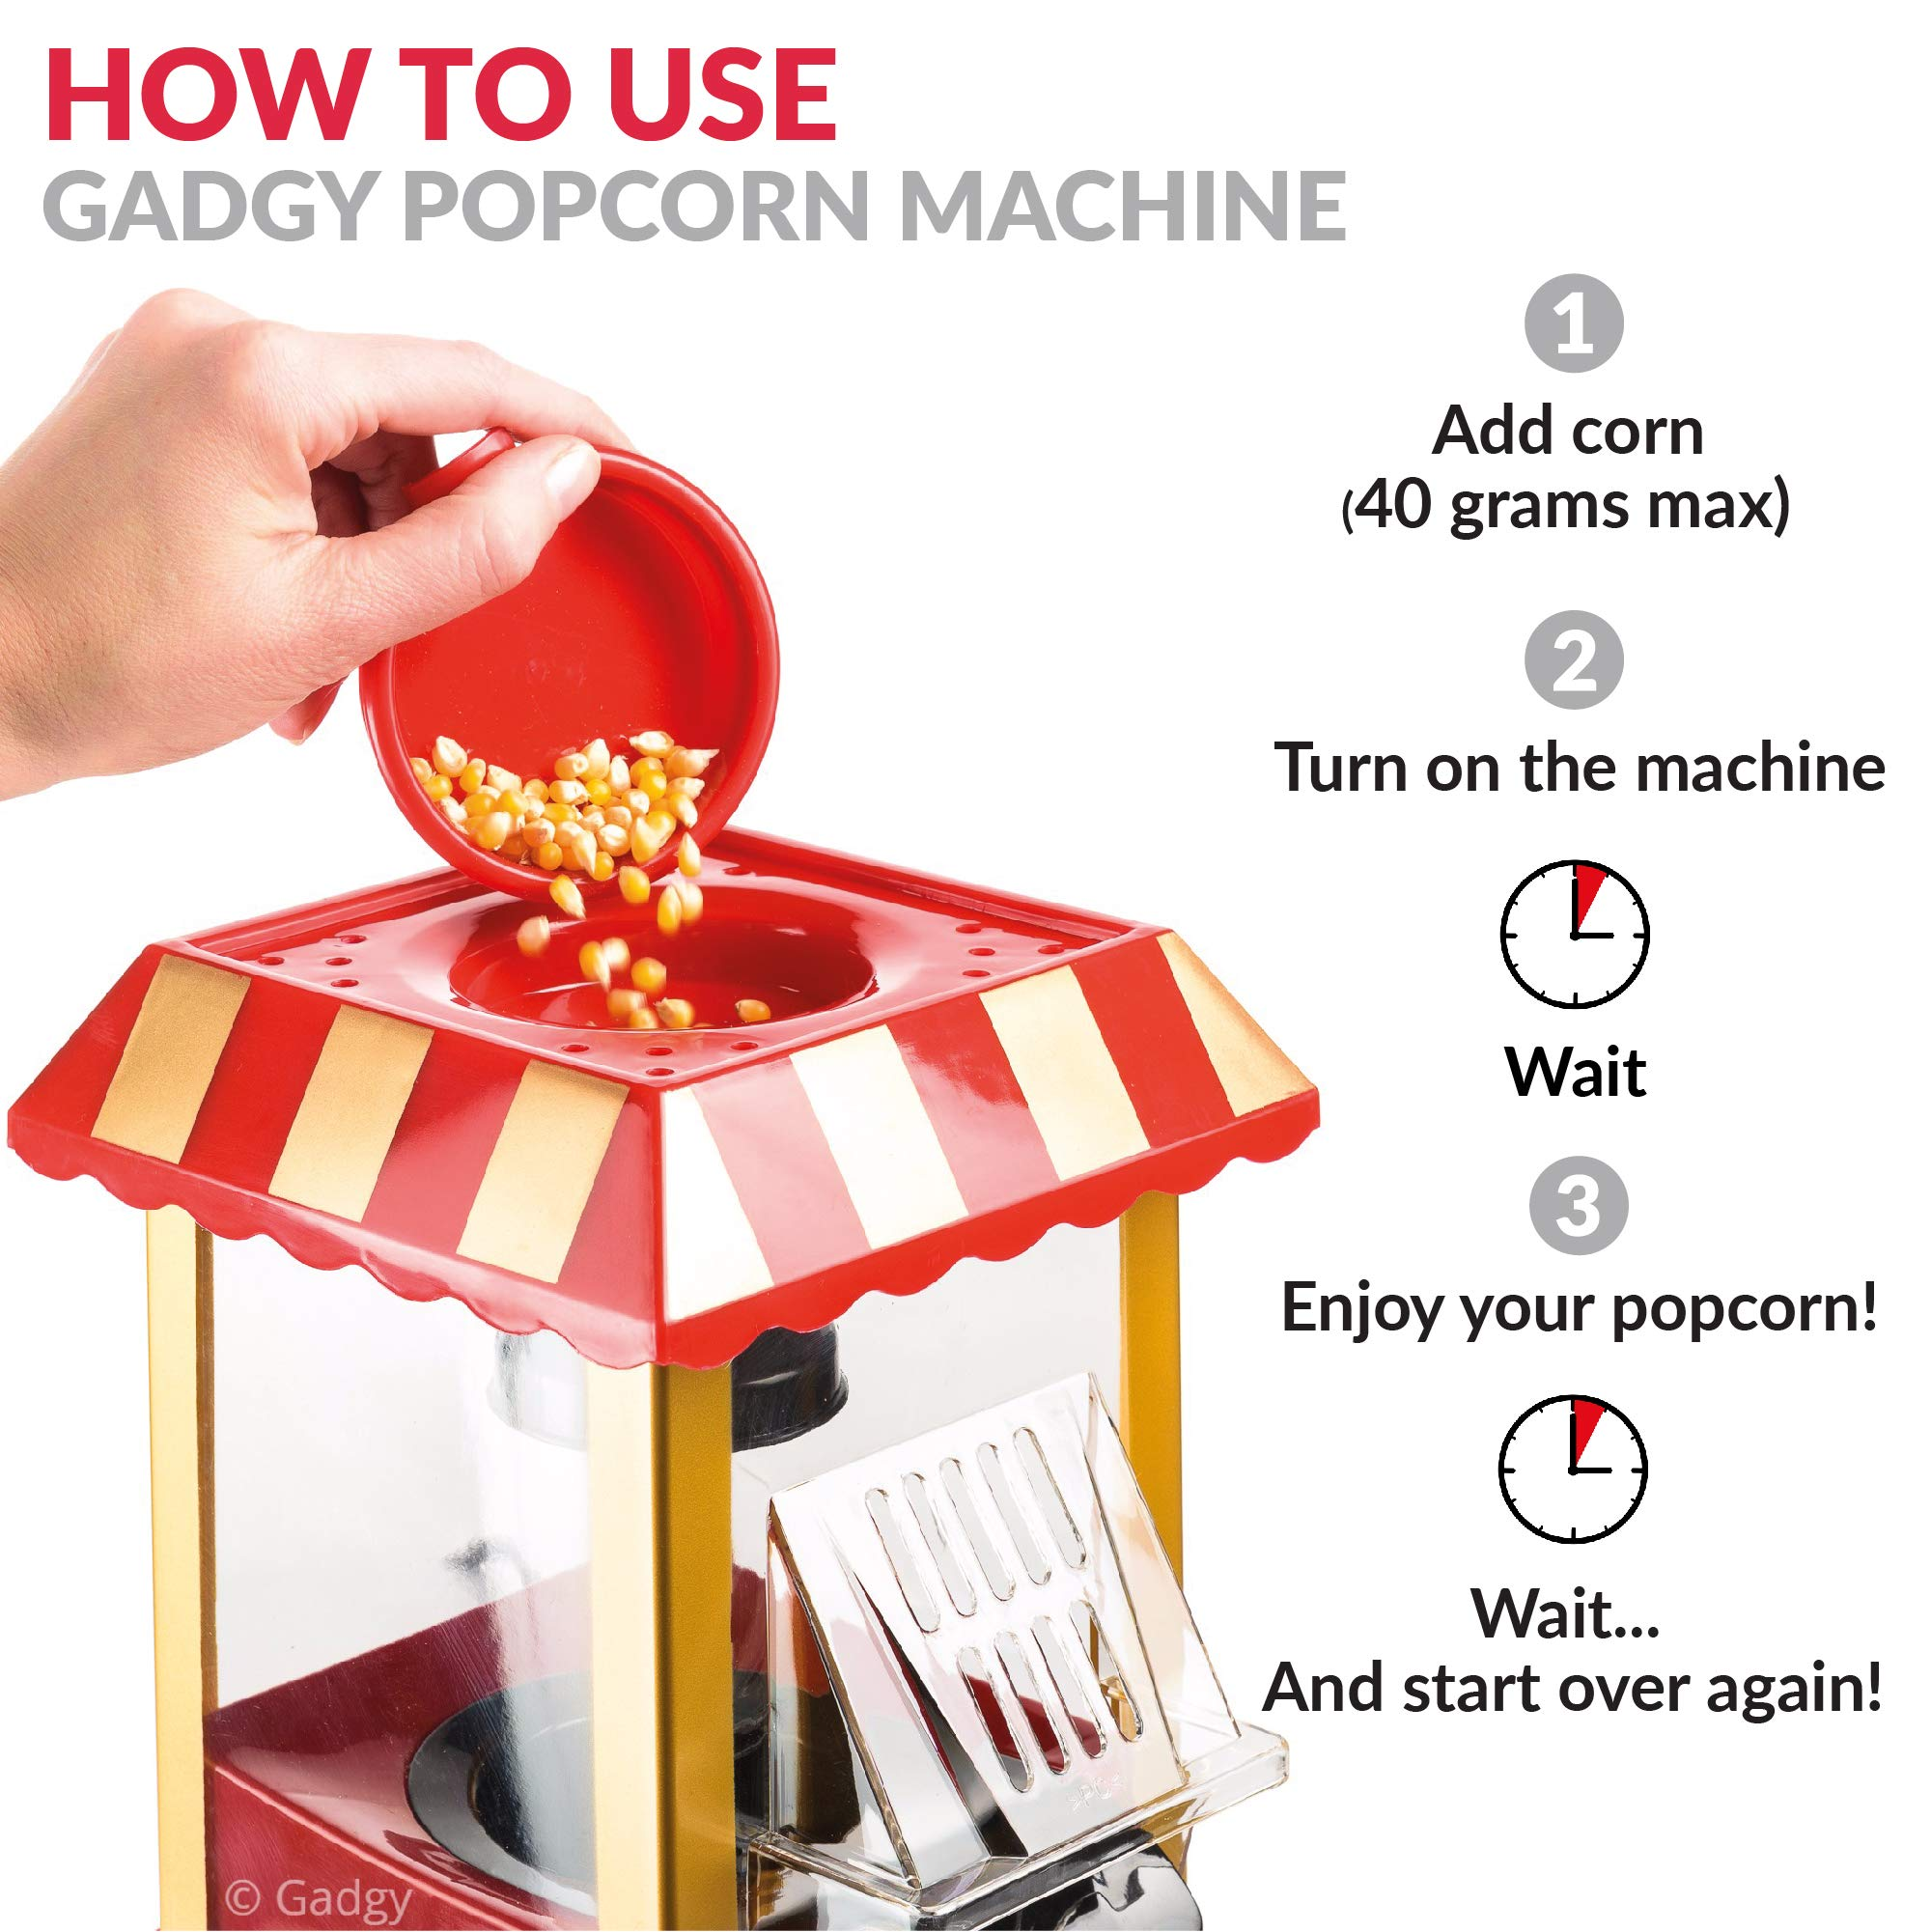 Gadgy Popcorn MaschineRetro Popcorn MakerHeissluft Ohne Fett Fettfrei